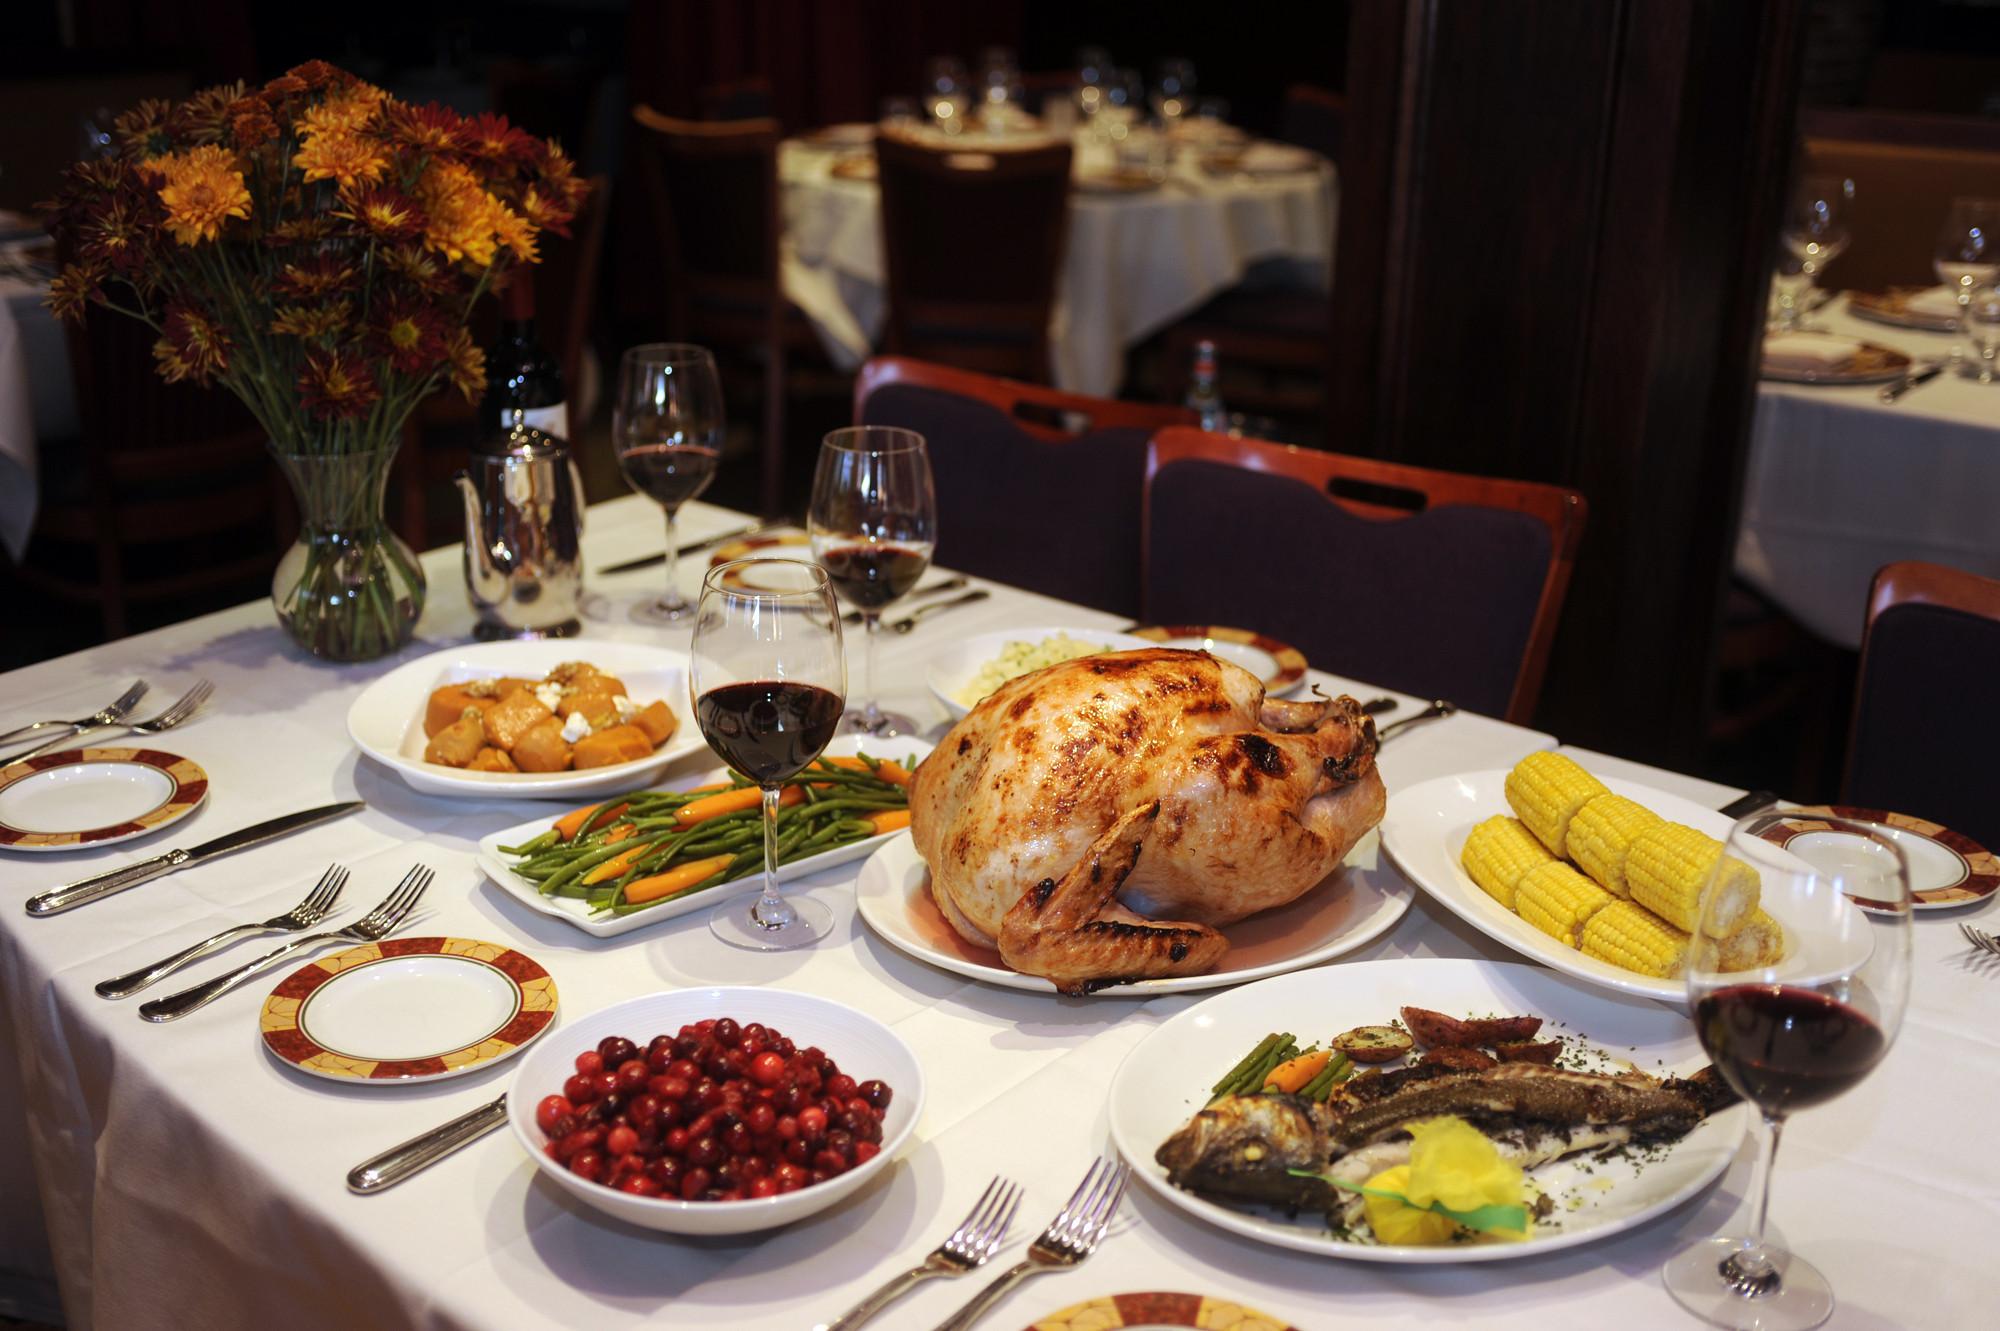 Thanksgiving Dinner Restaurant  Where to dine on Thanksgiving Day in Baltimore